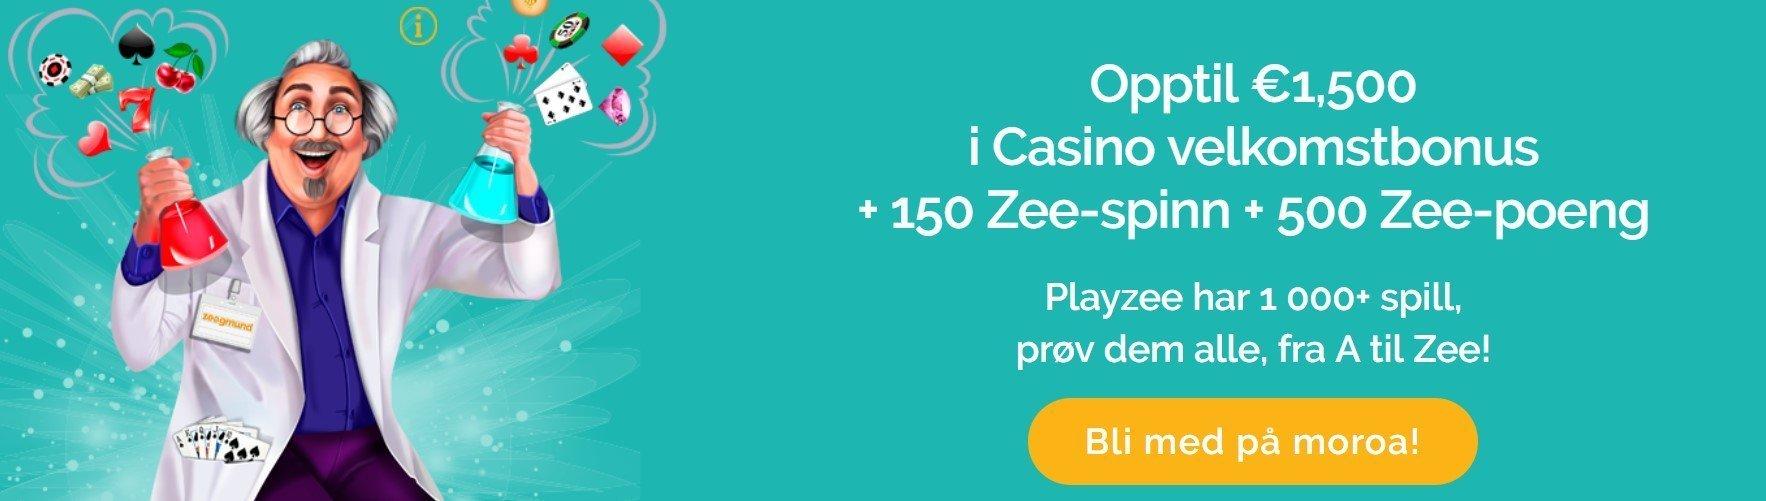 PlayZee Casino velkomstbonus